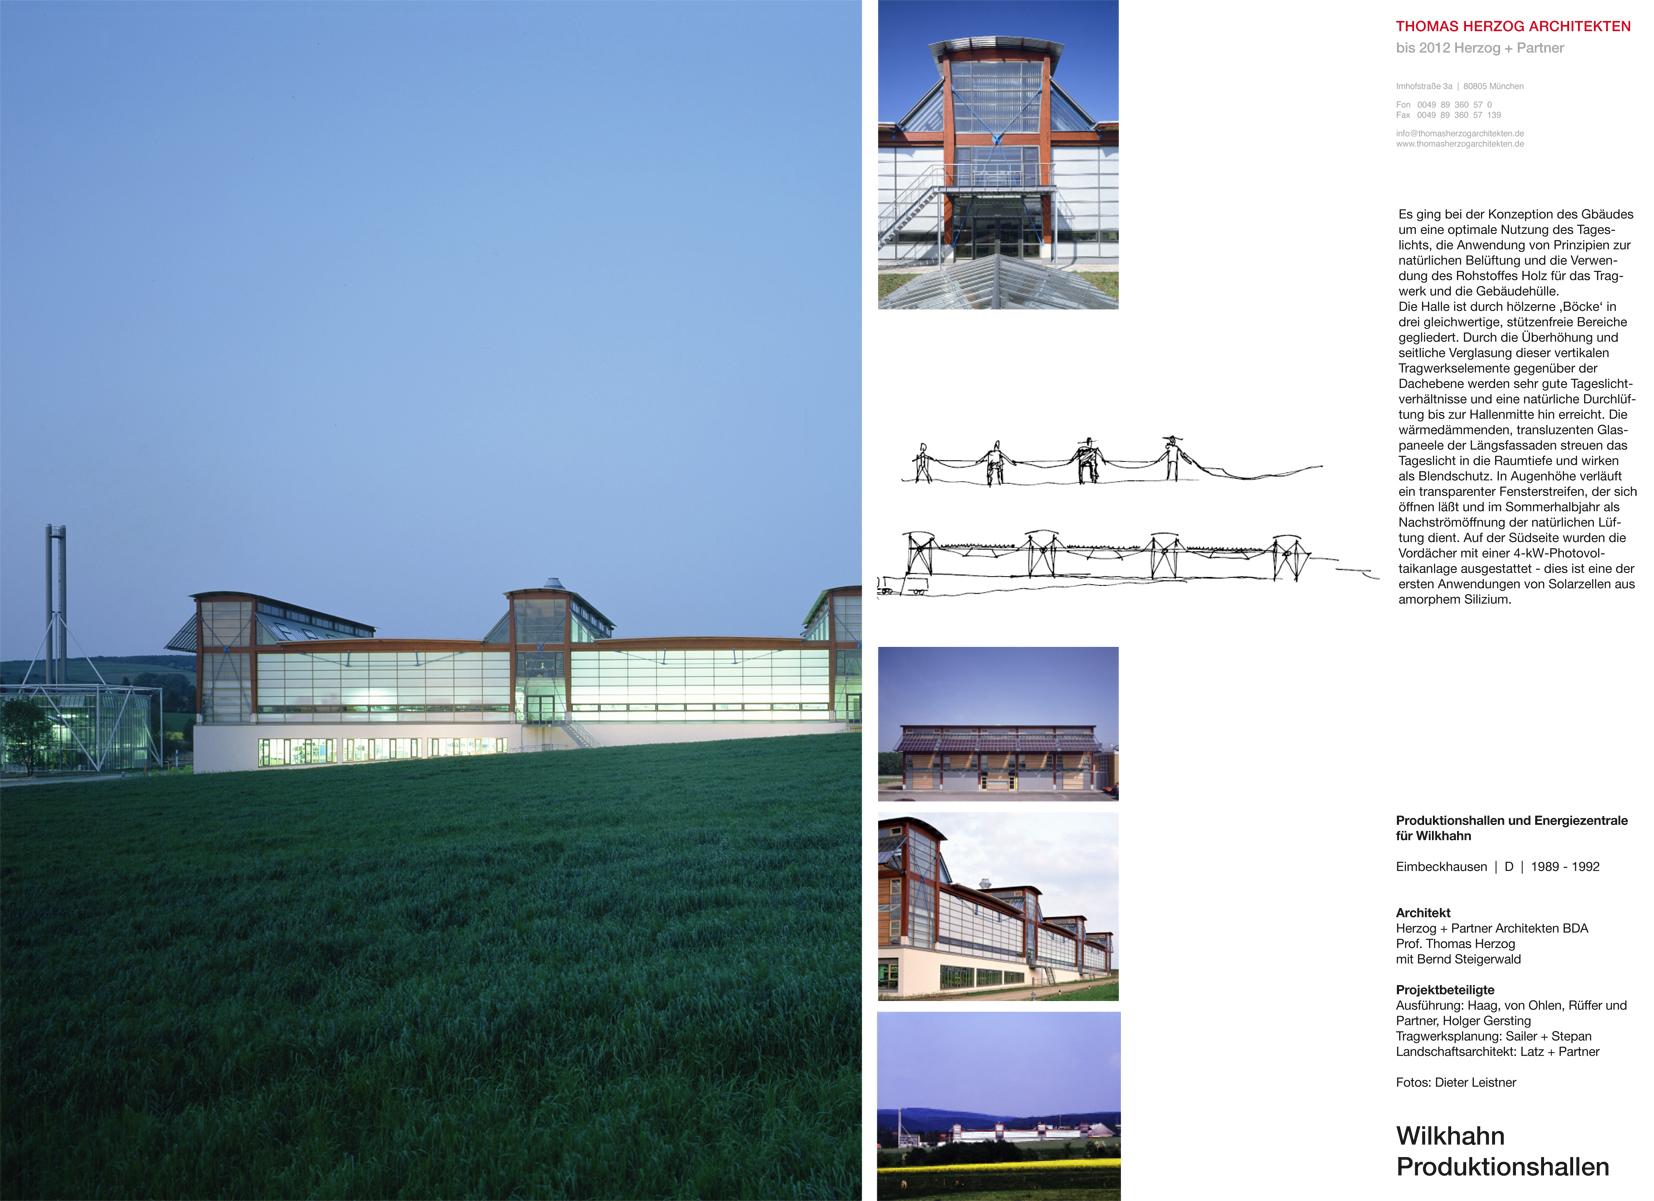 Wilkhahn Produktionshallen Eimbeckhausen DE 1992